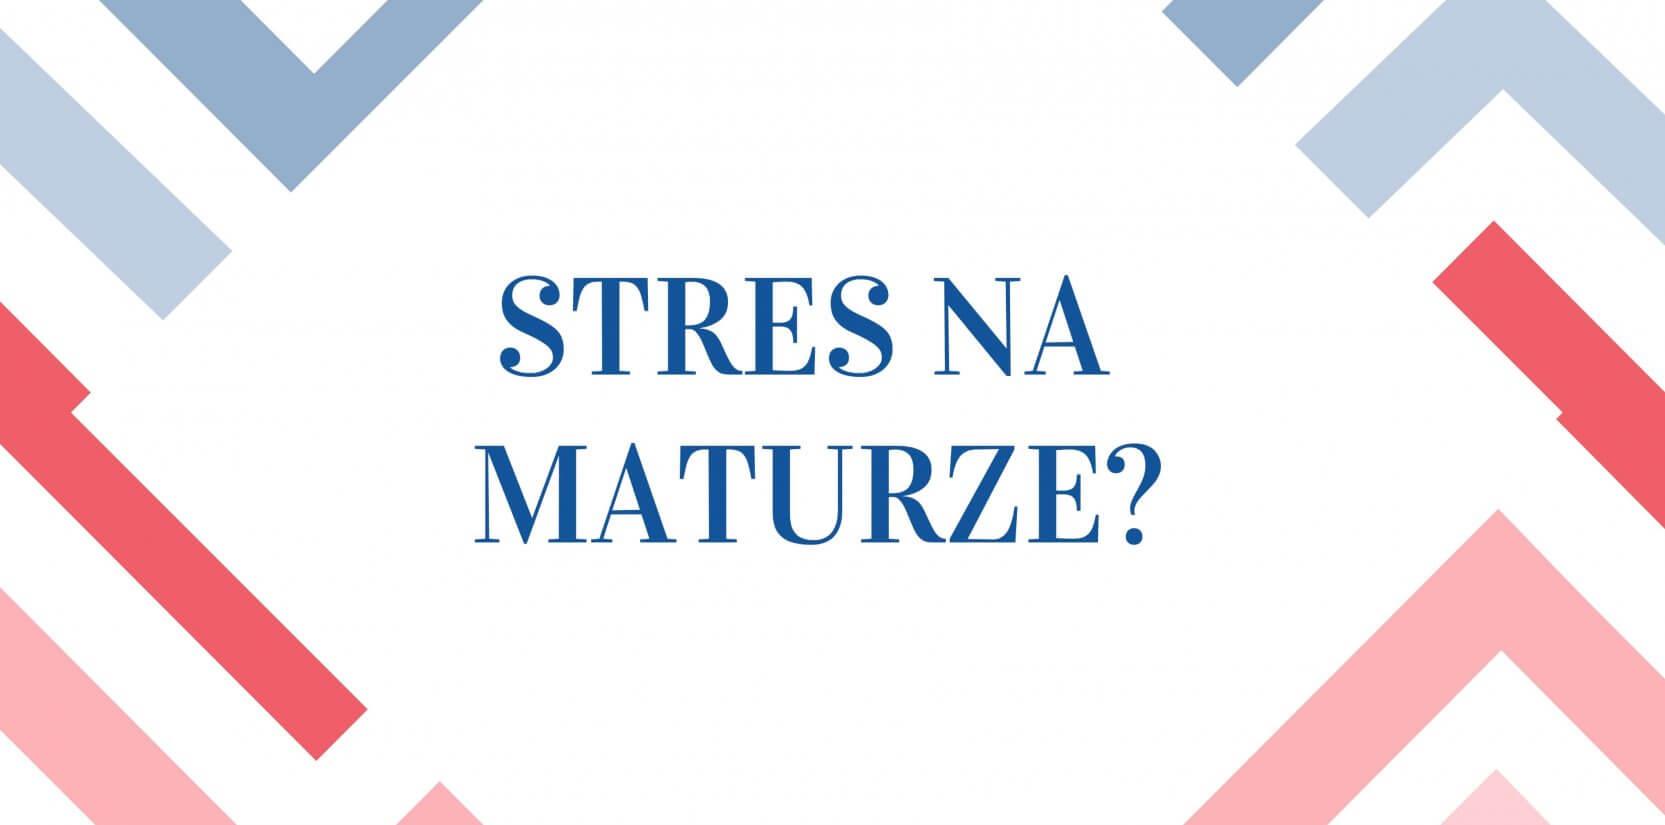 stres na maturze - jak go uniknąć